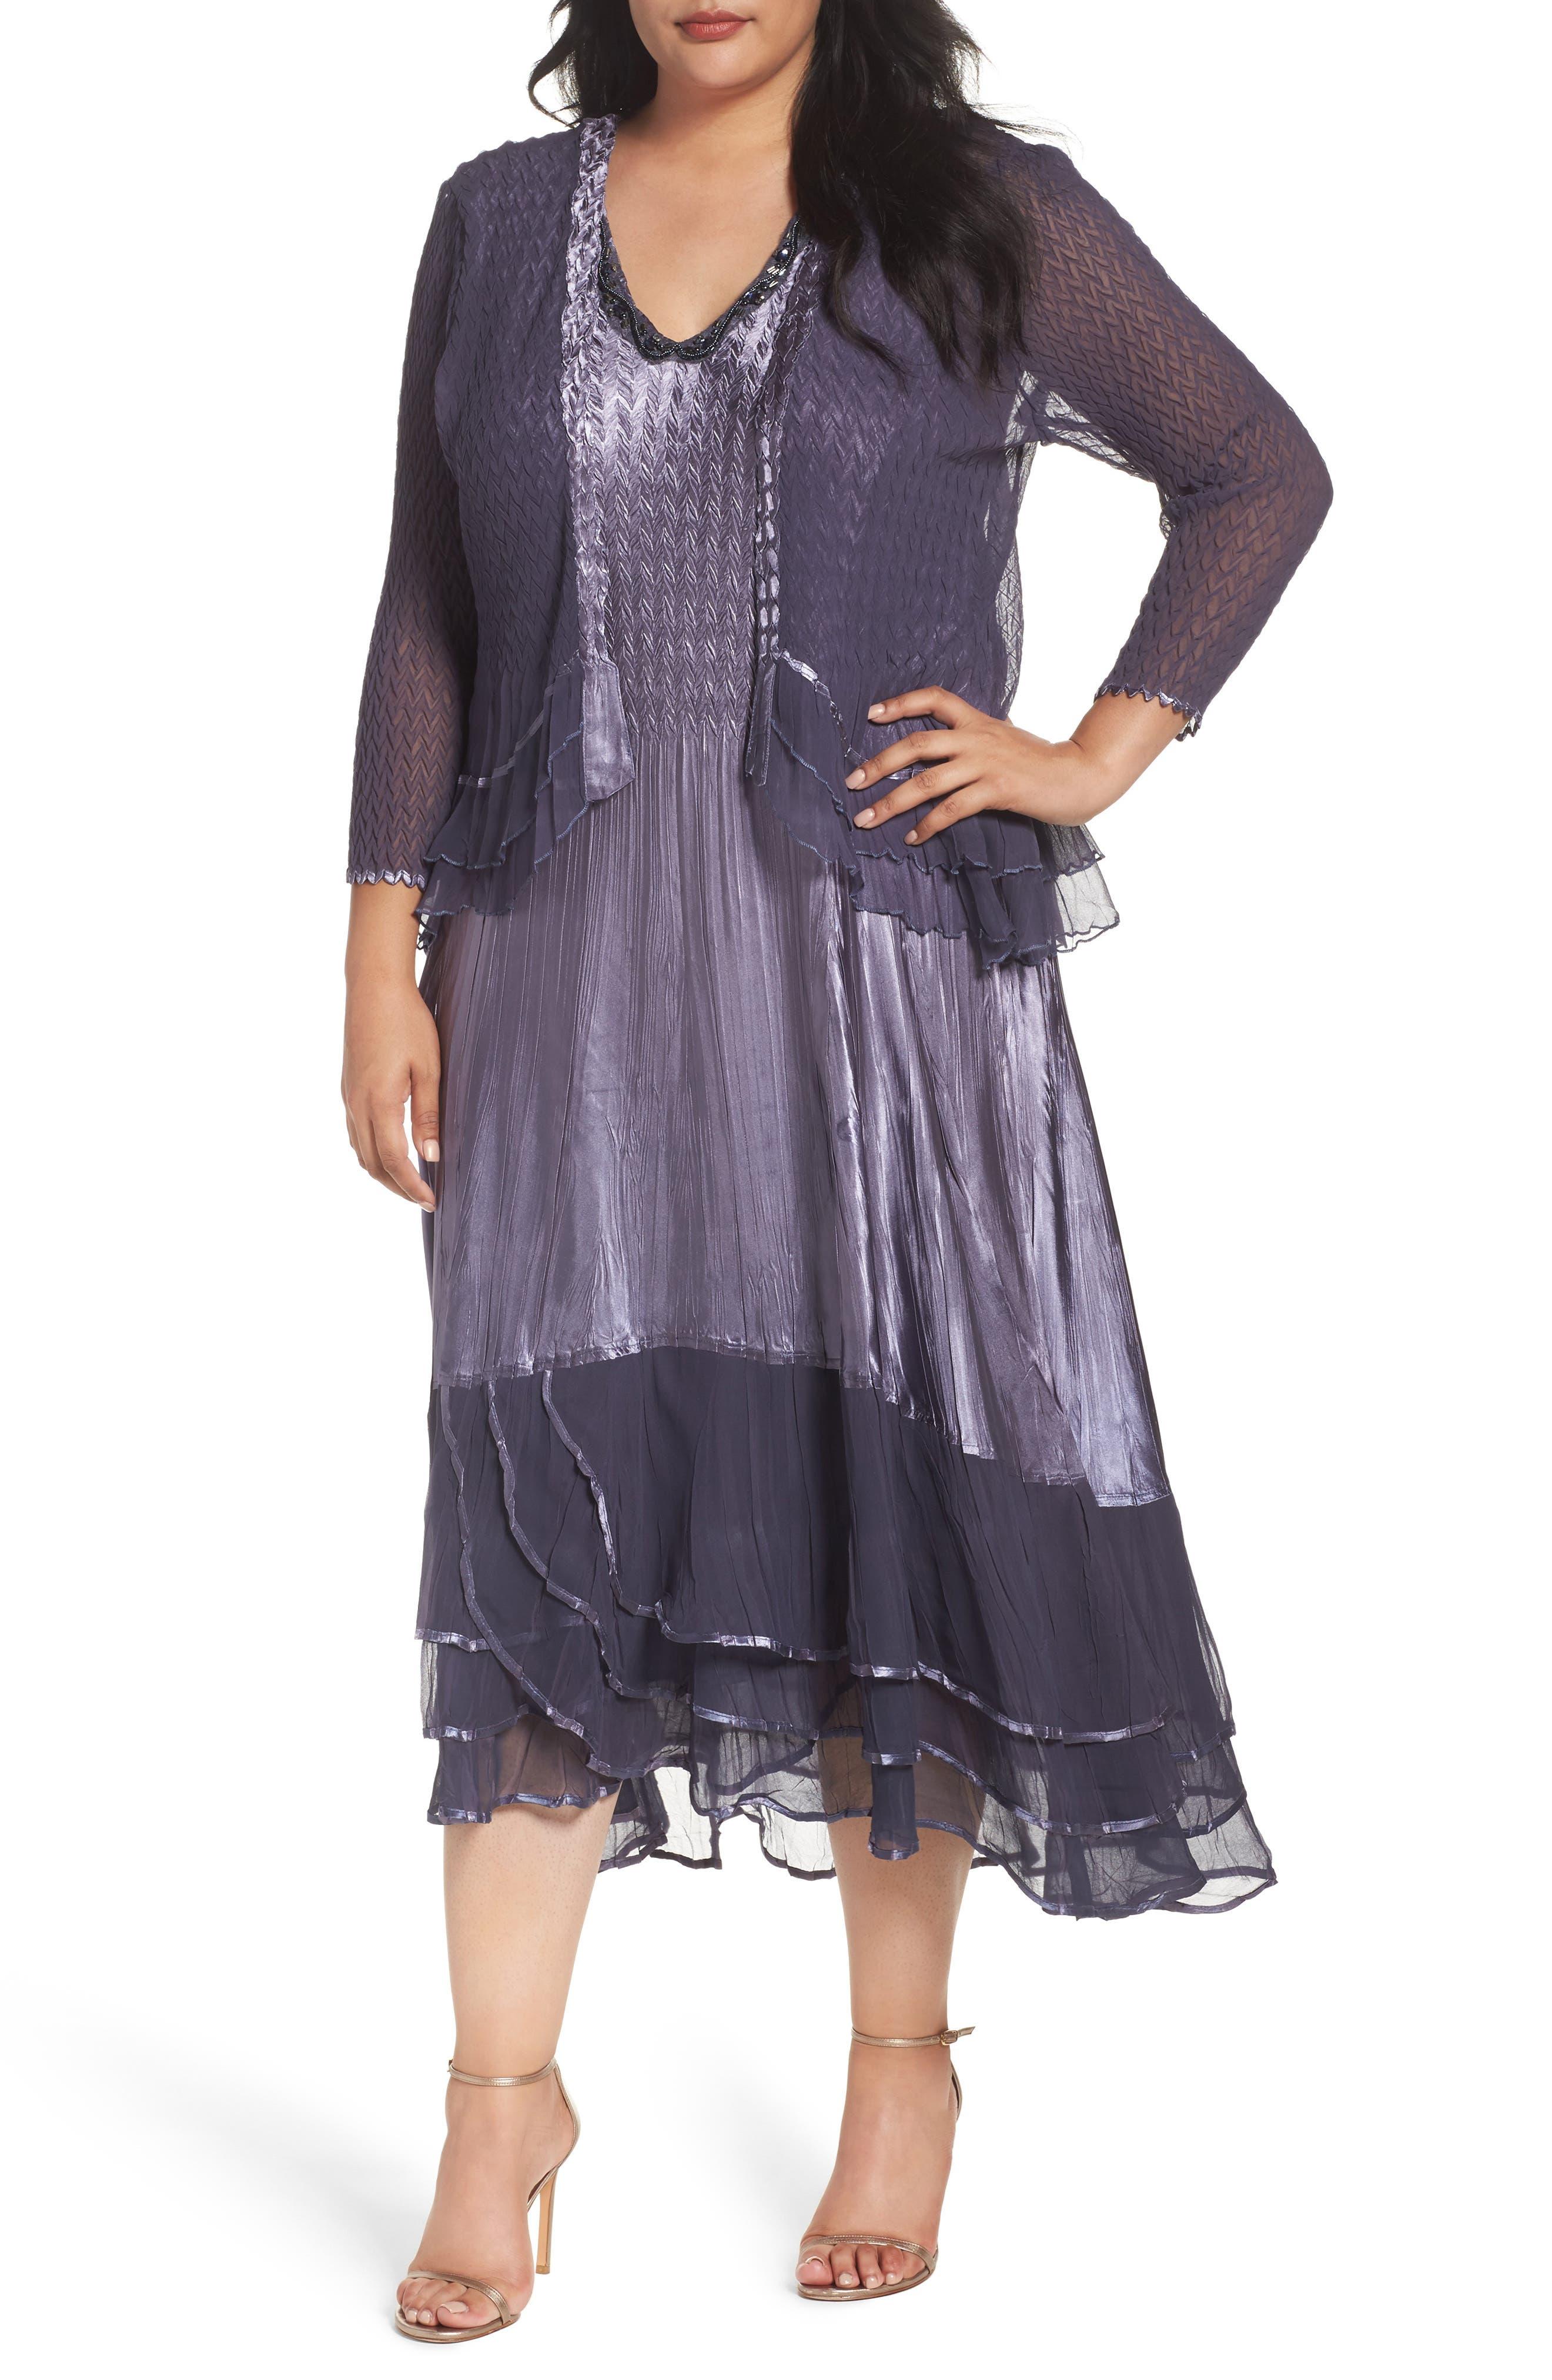 KOMAROV Embellished Tiered Dress with Jacket